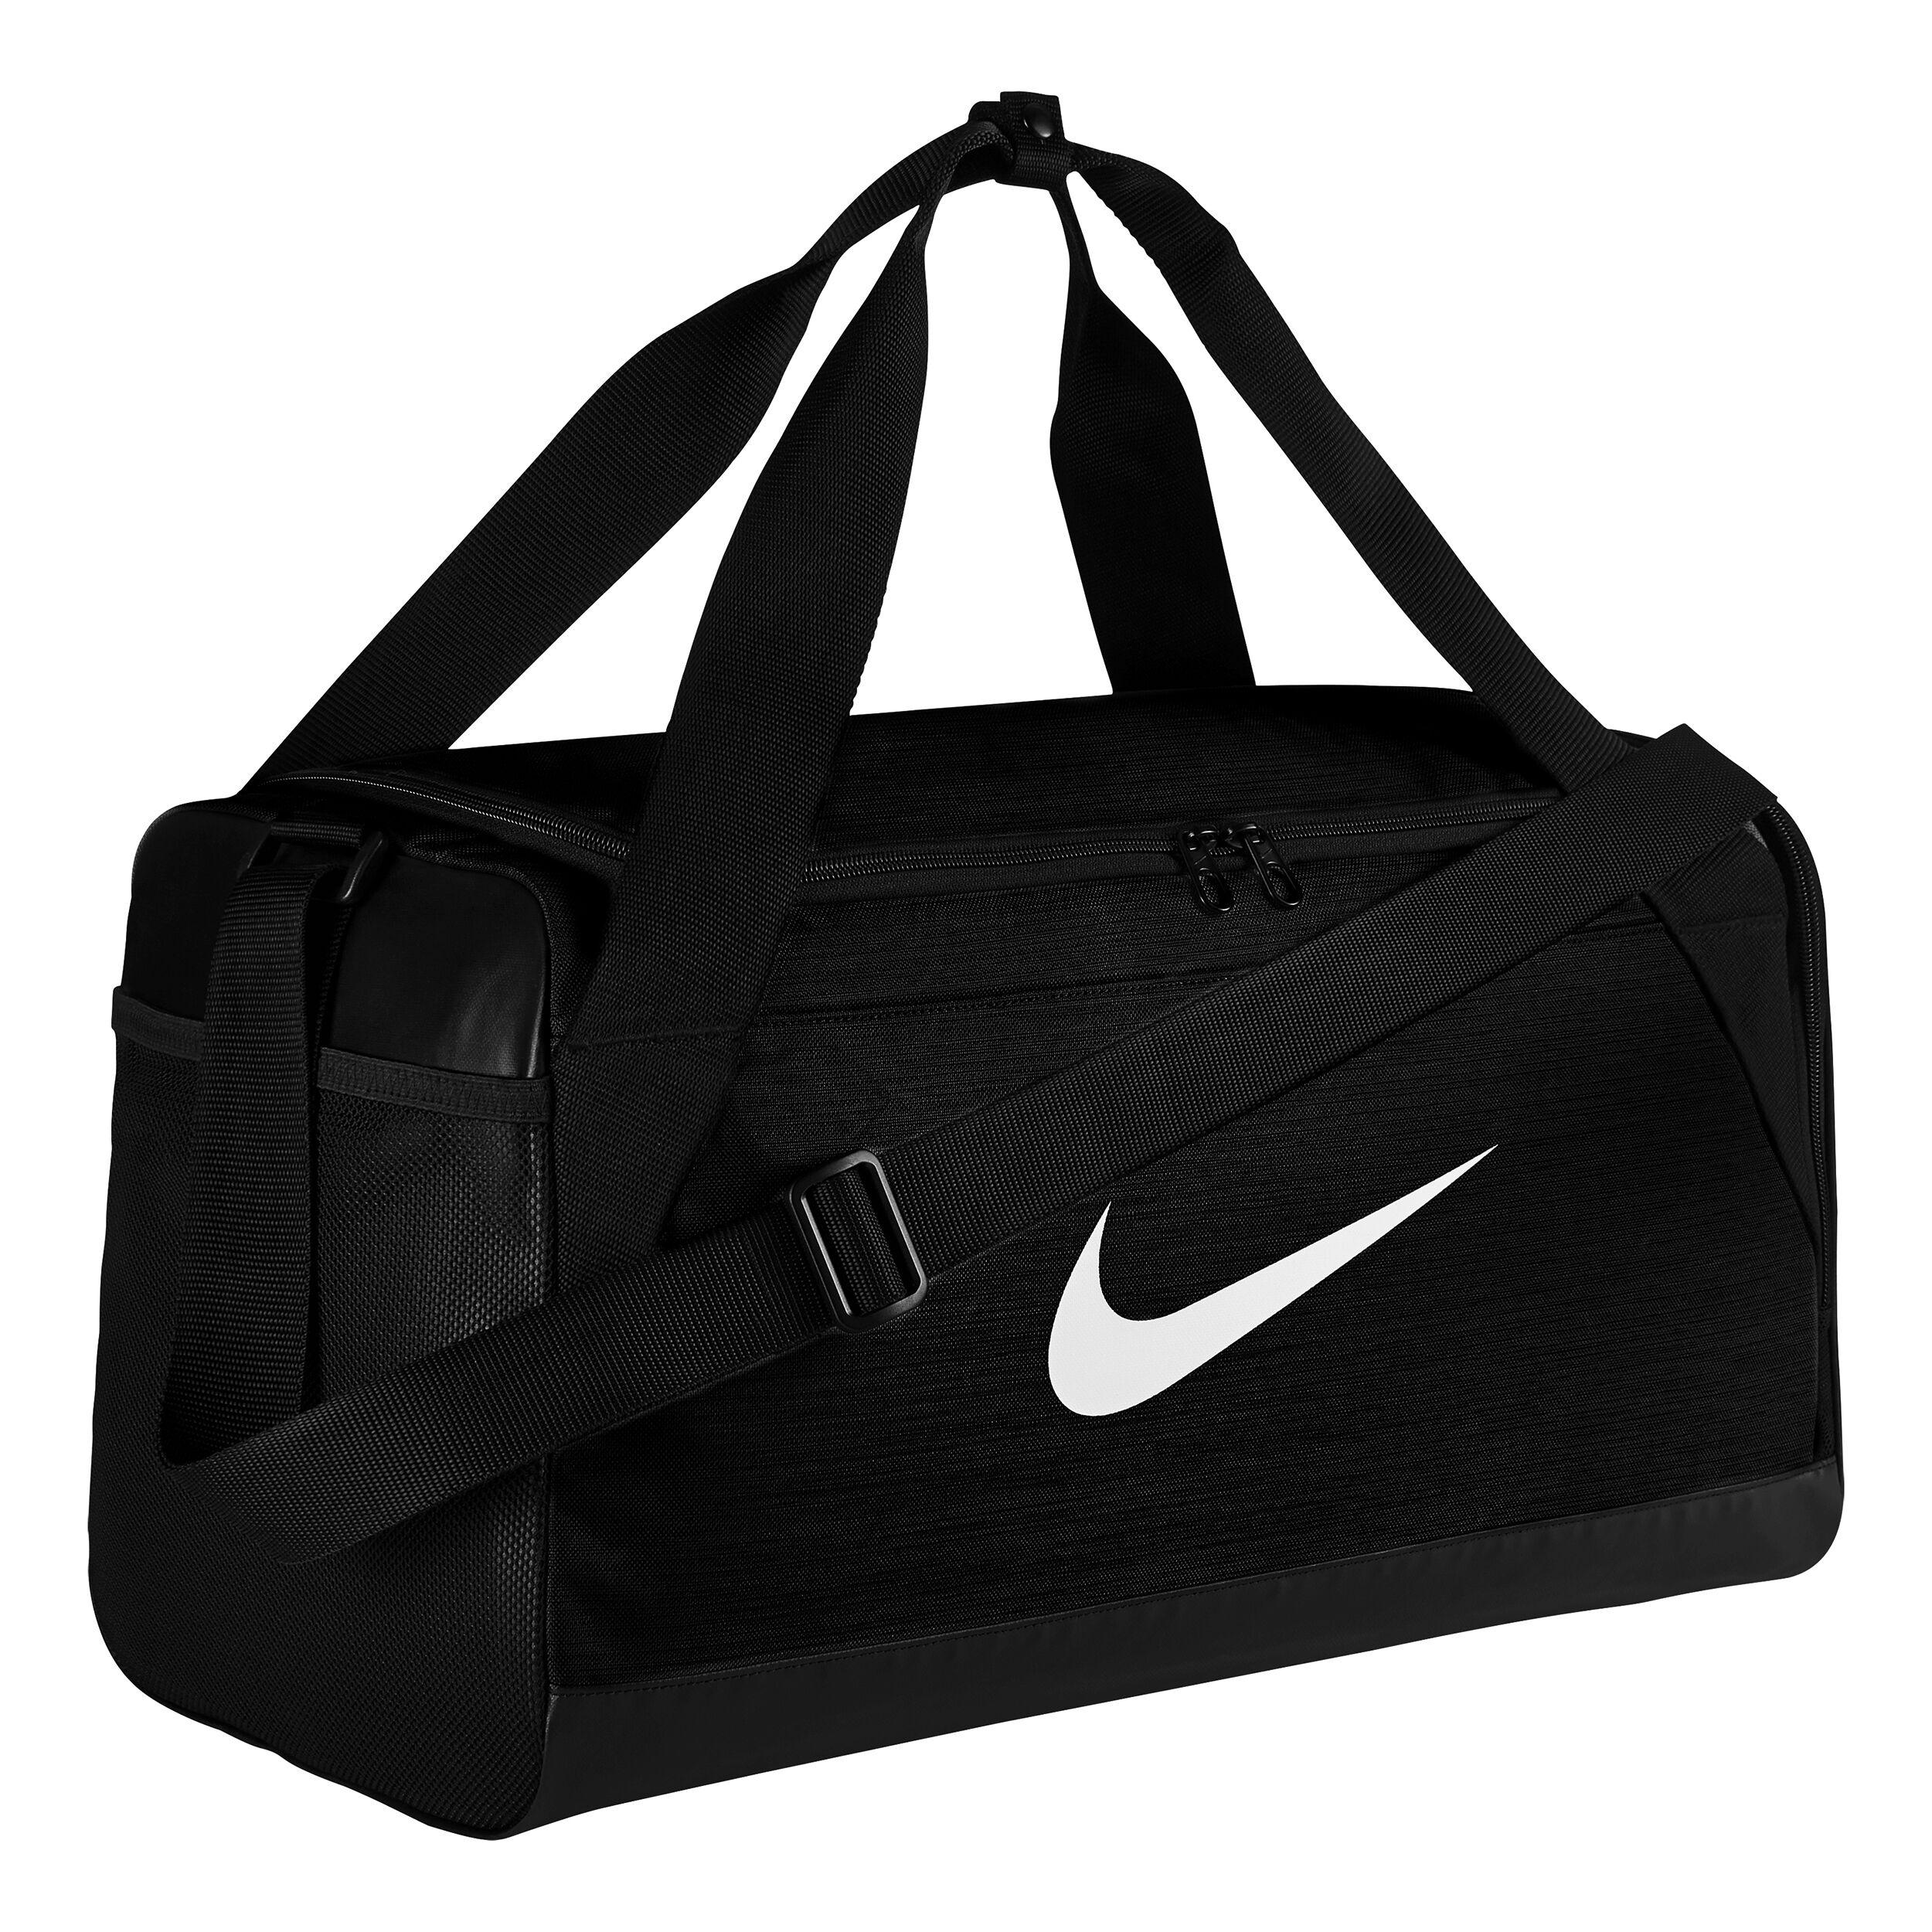 Nike Brasilia Duffel Sportväska Liten Svart, Svart